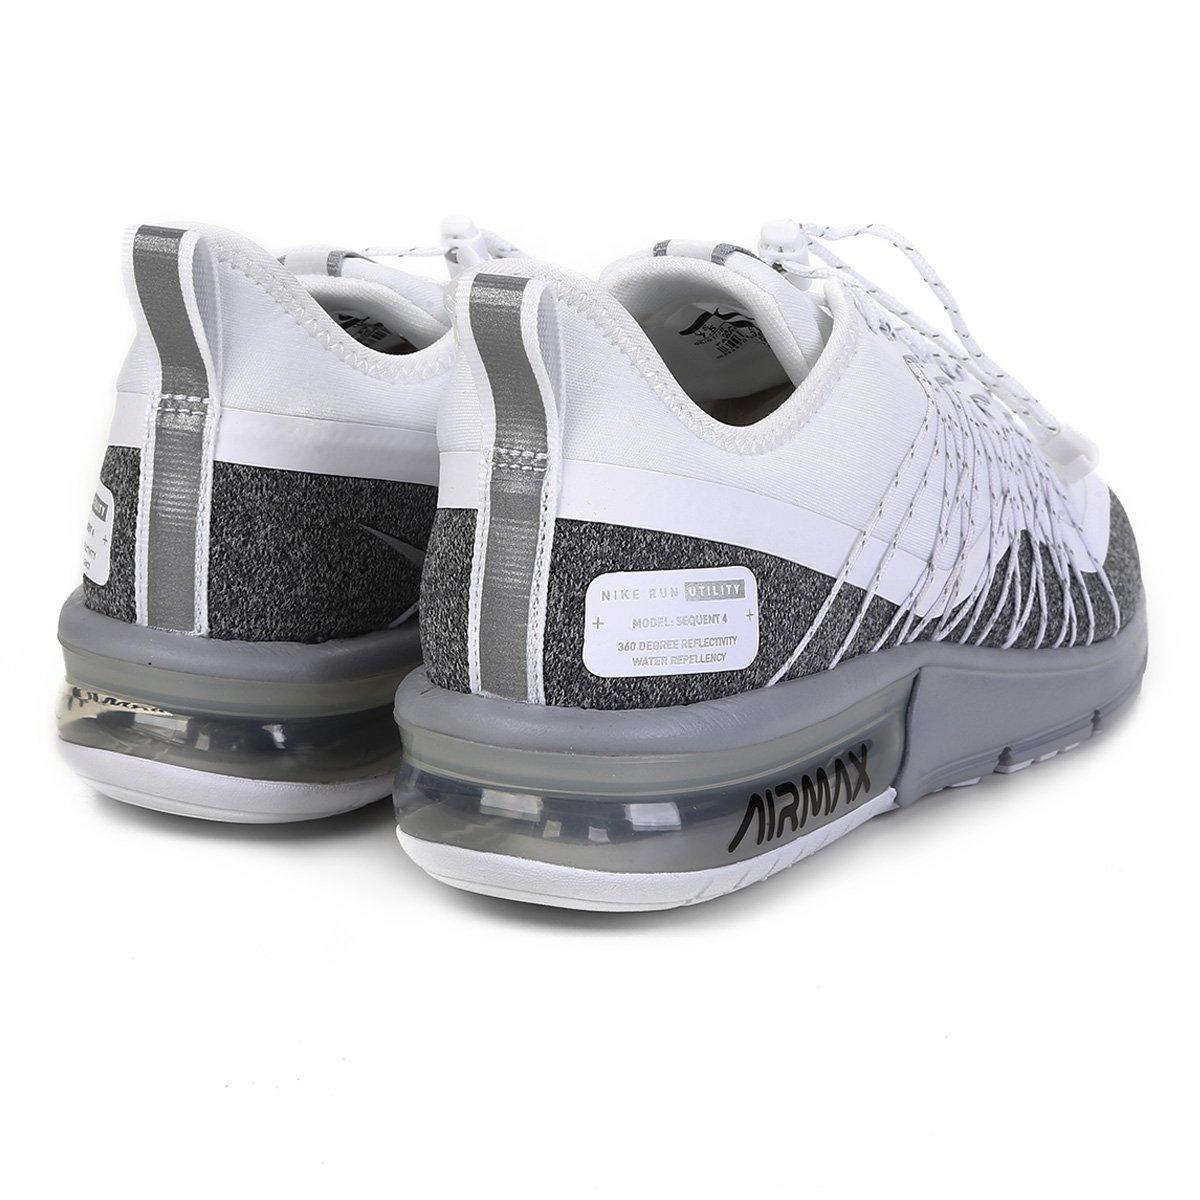 Tênis Nike Air Max Sequent 4 Utility Feminino - Tam: 34 - 2